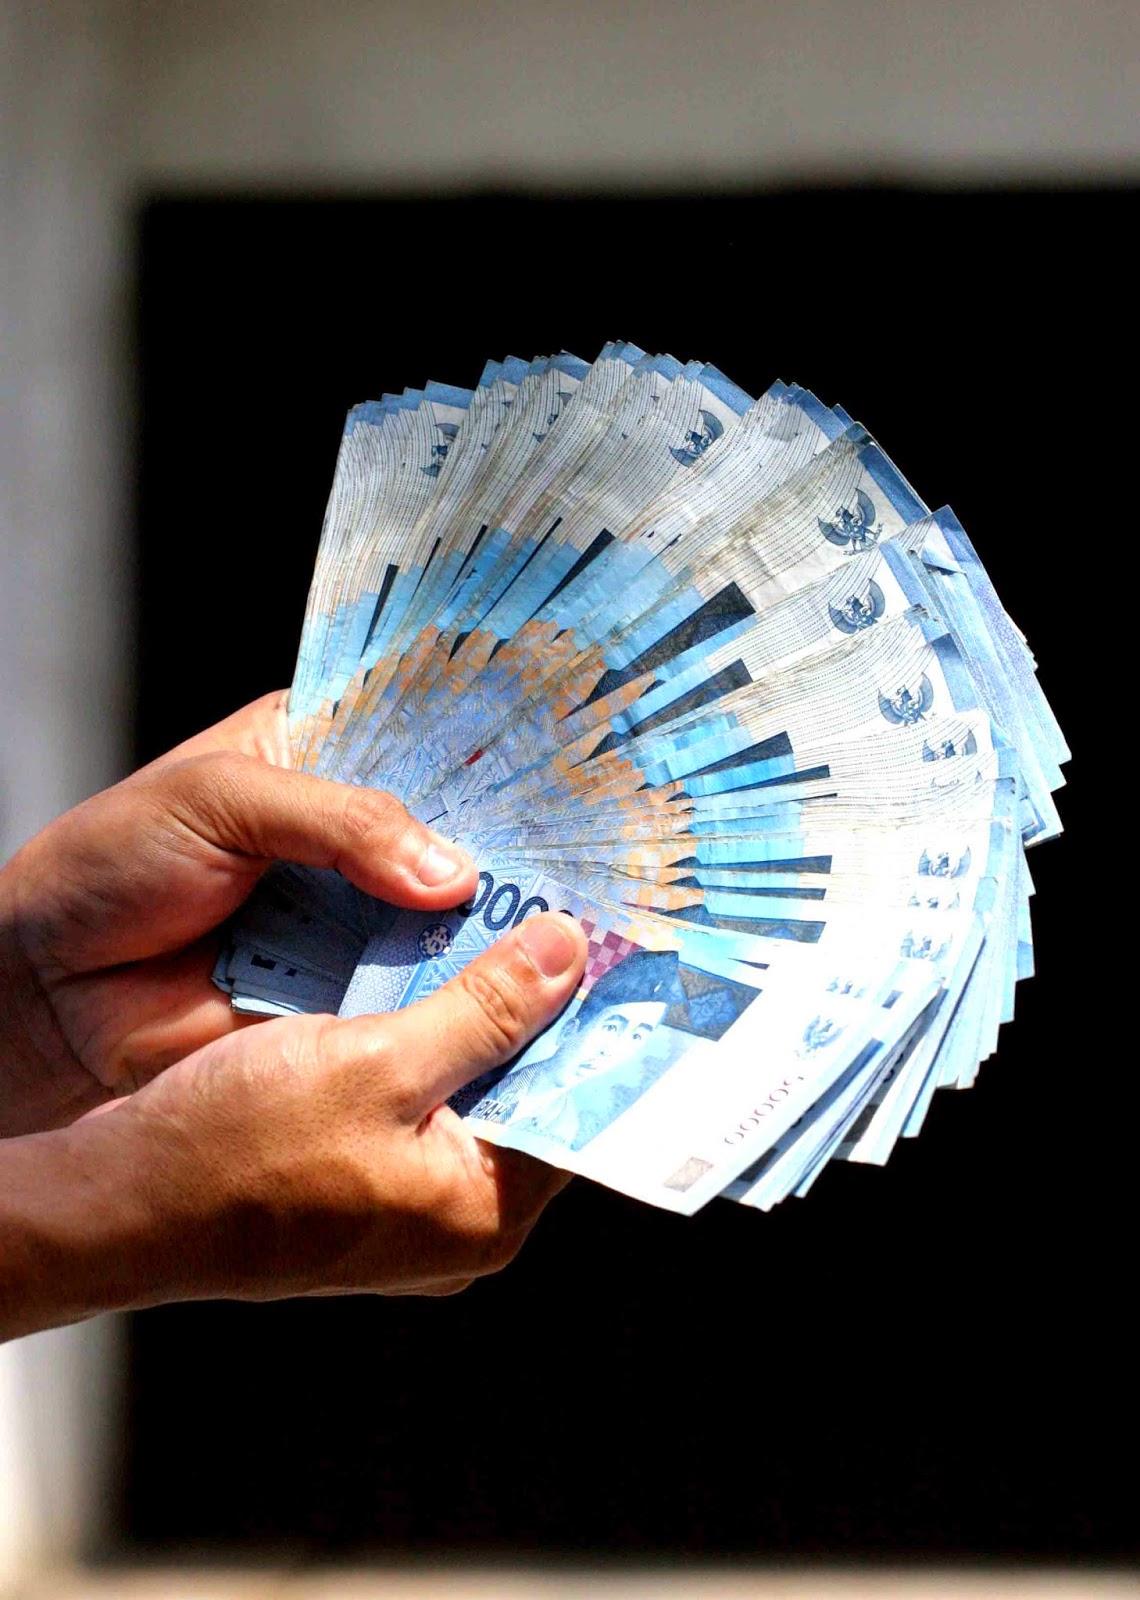 http://www.operatorsekolah.com/2015/04/guru-non-pns-dapat-subsidi-300rb-per.html